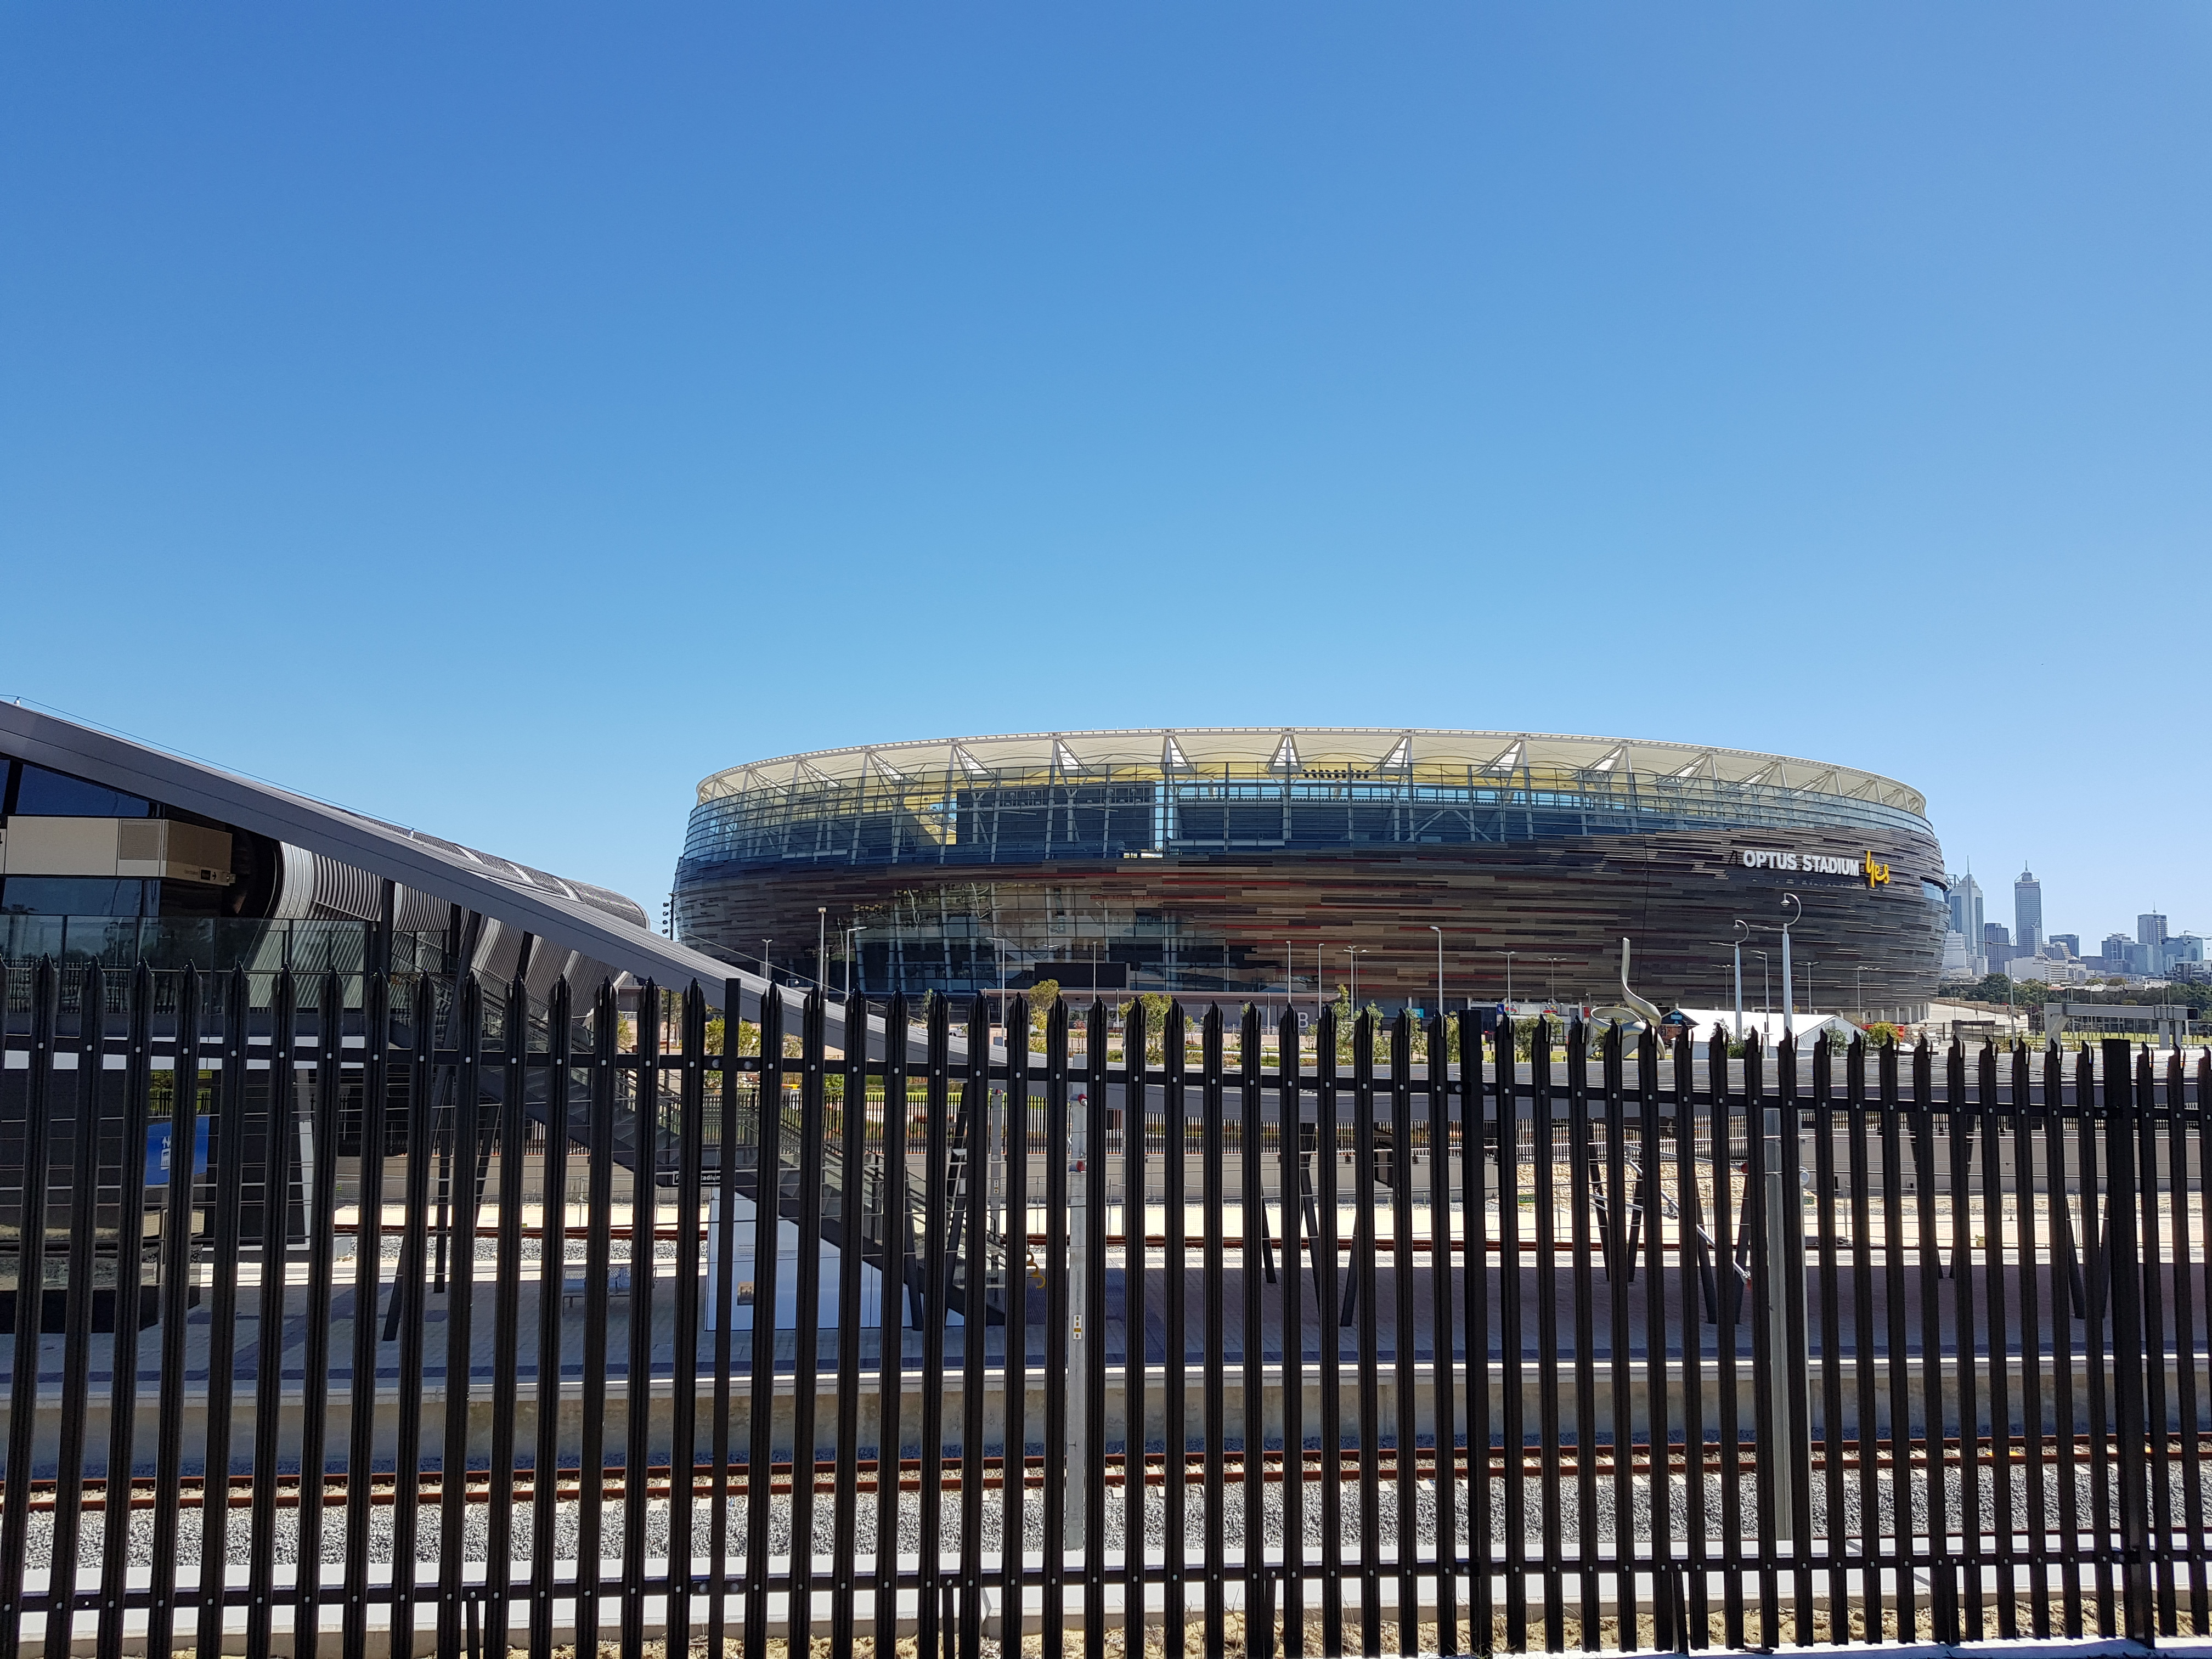 Palisade Fence, Optus Stadium